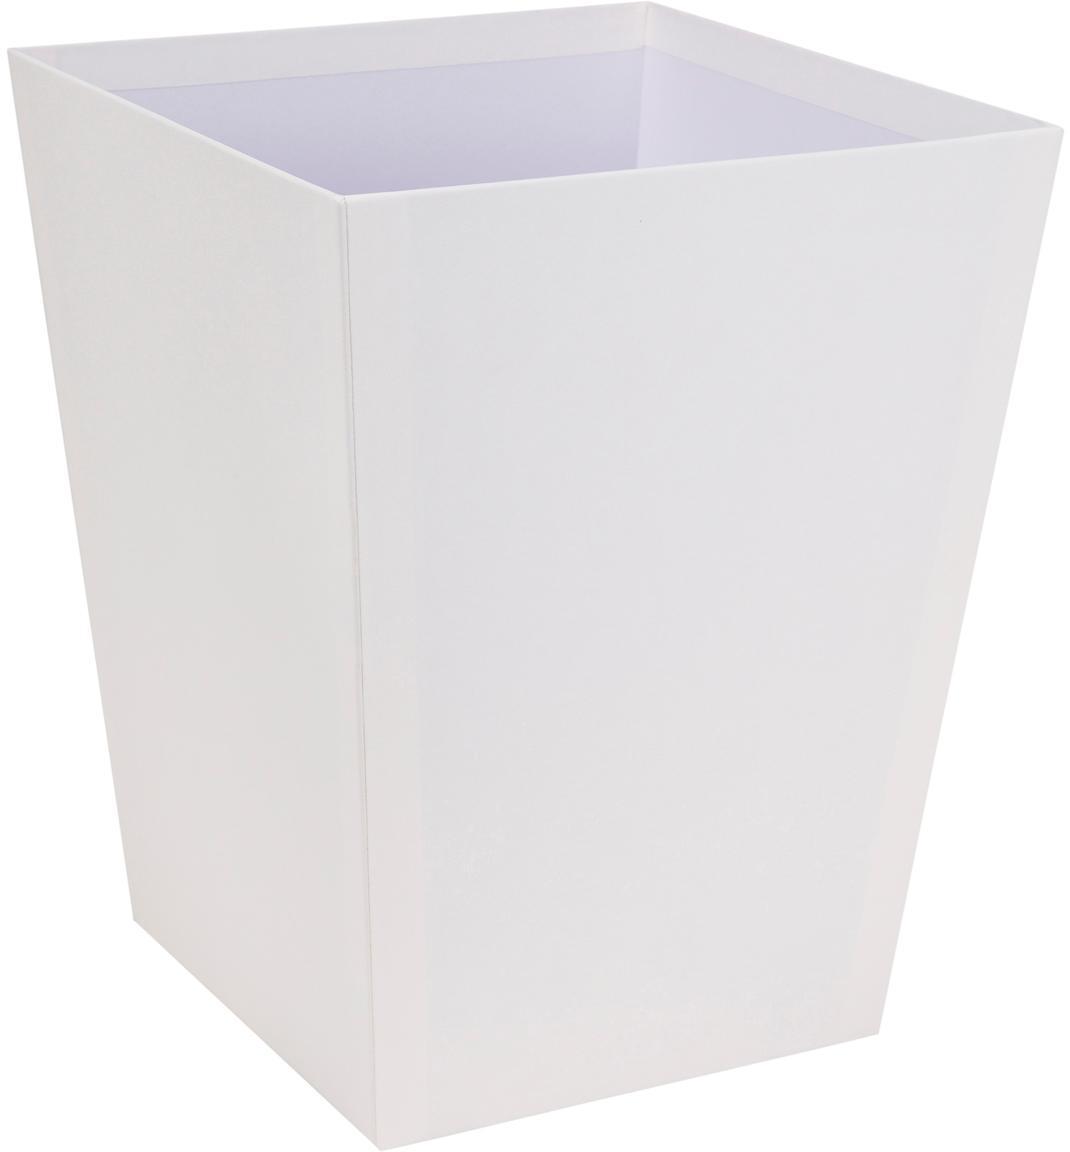 Cestino per carta Sofia, Solido, cartone laminato, Bianco, Larg. 26 x Alt. 33 cm